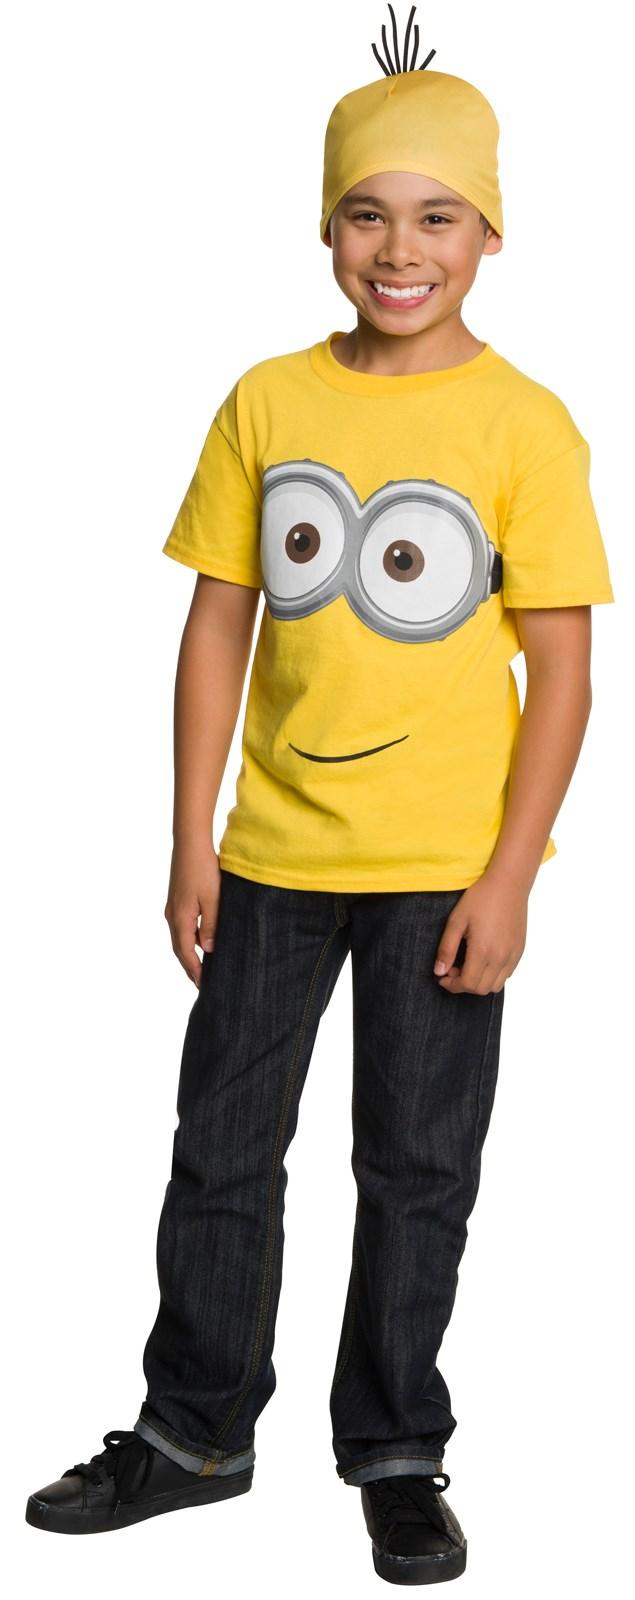 minions movie minion t shirt headpiece for kids. Black Bedroom Furniture Sets. Home Design Ideas